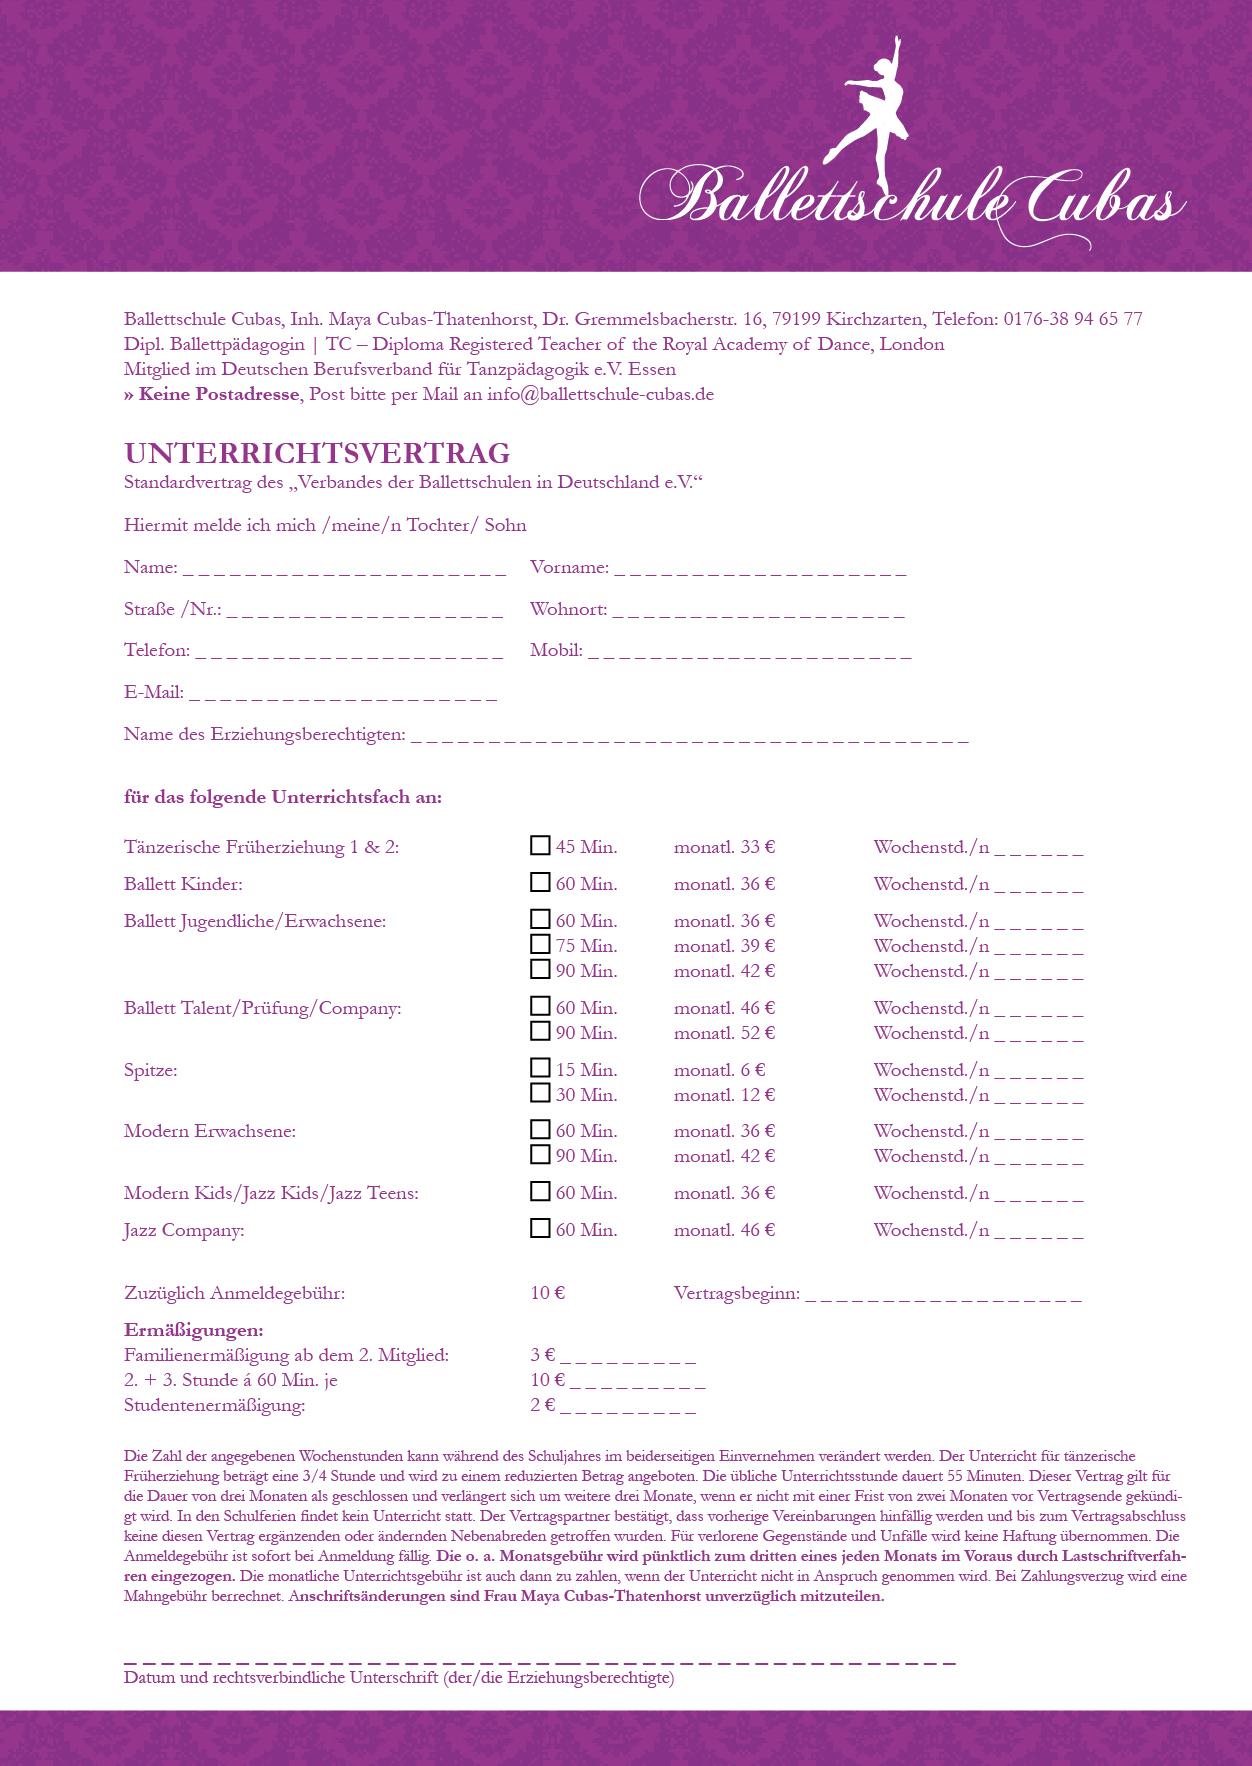 unterrichtsvertrag-ballettschule-cubas_0919